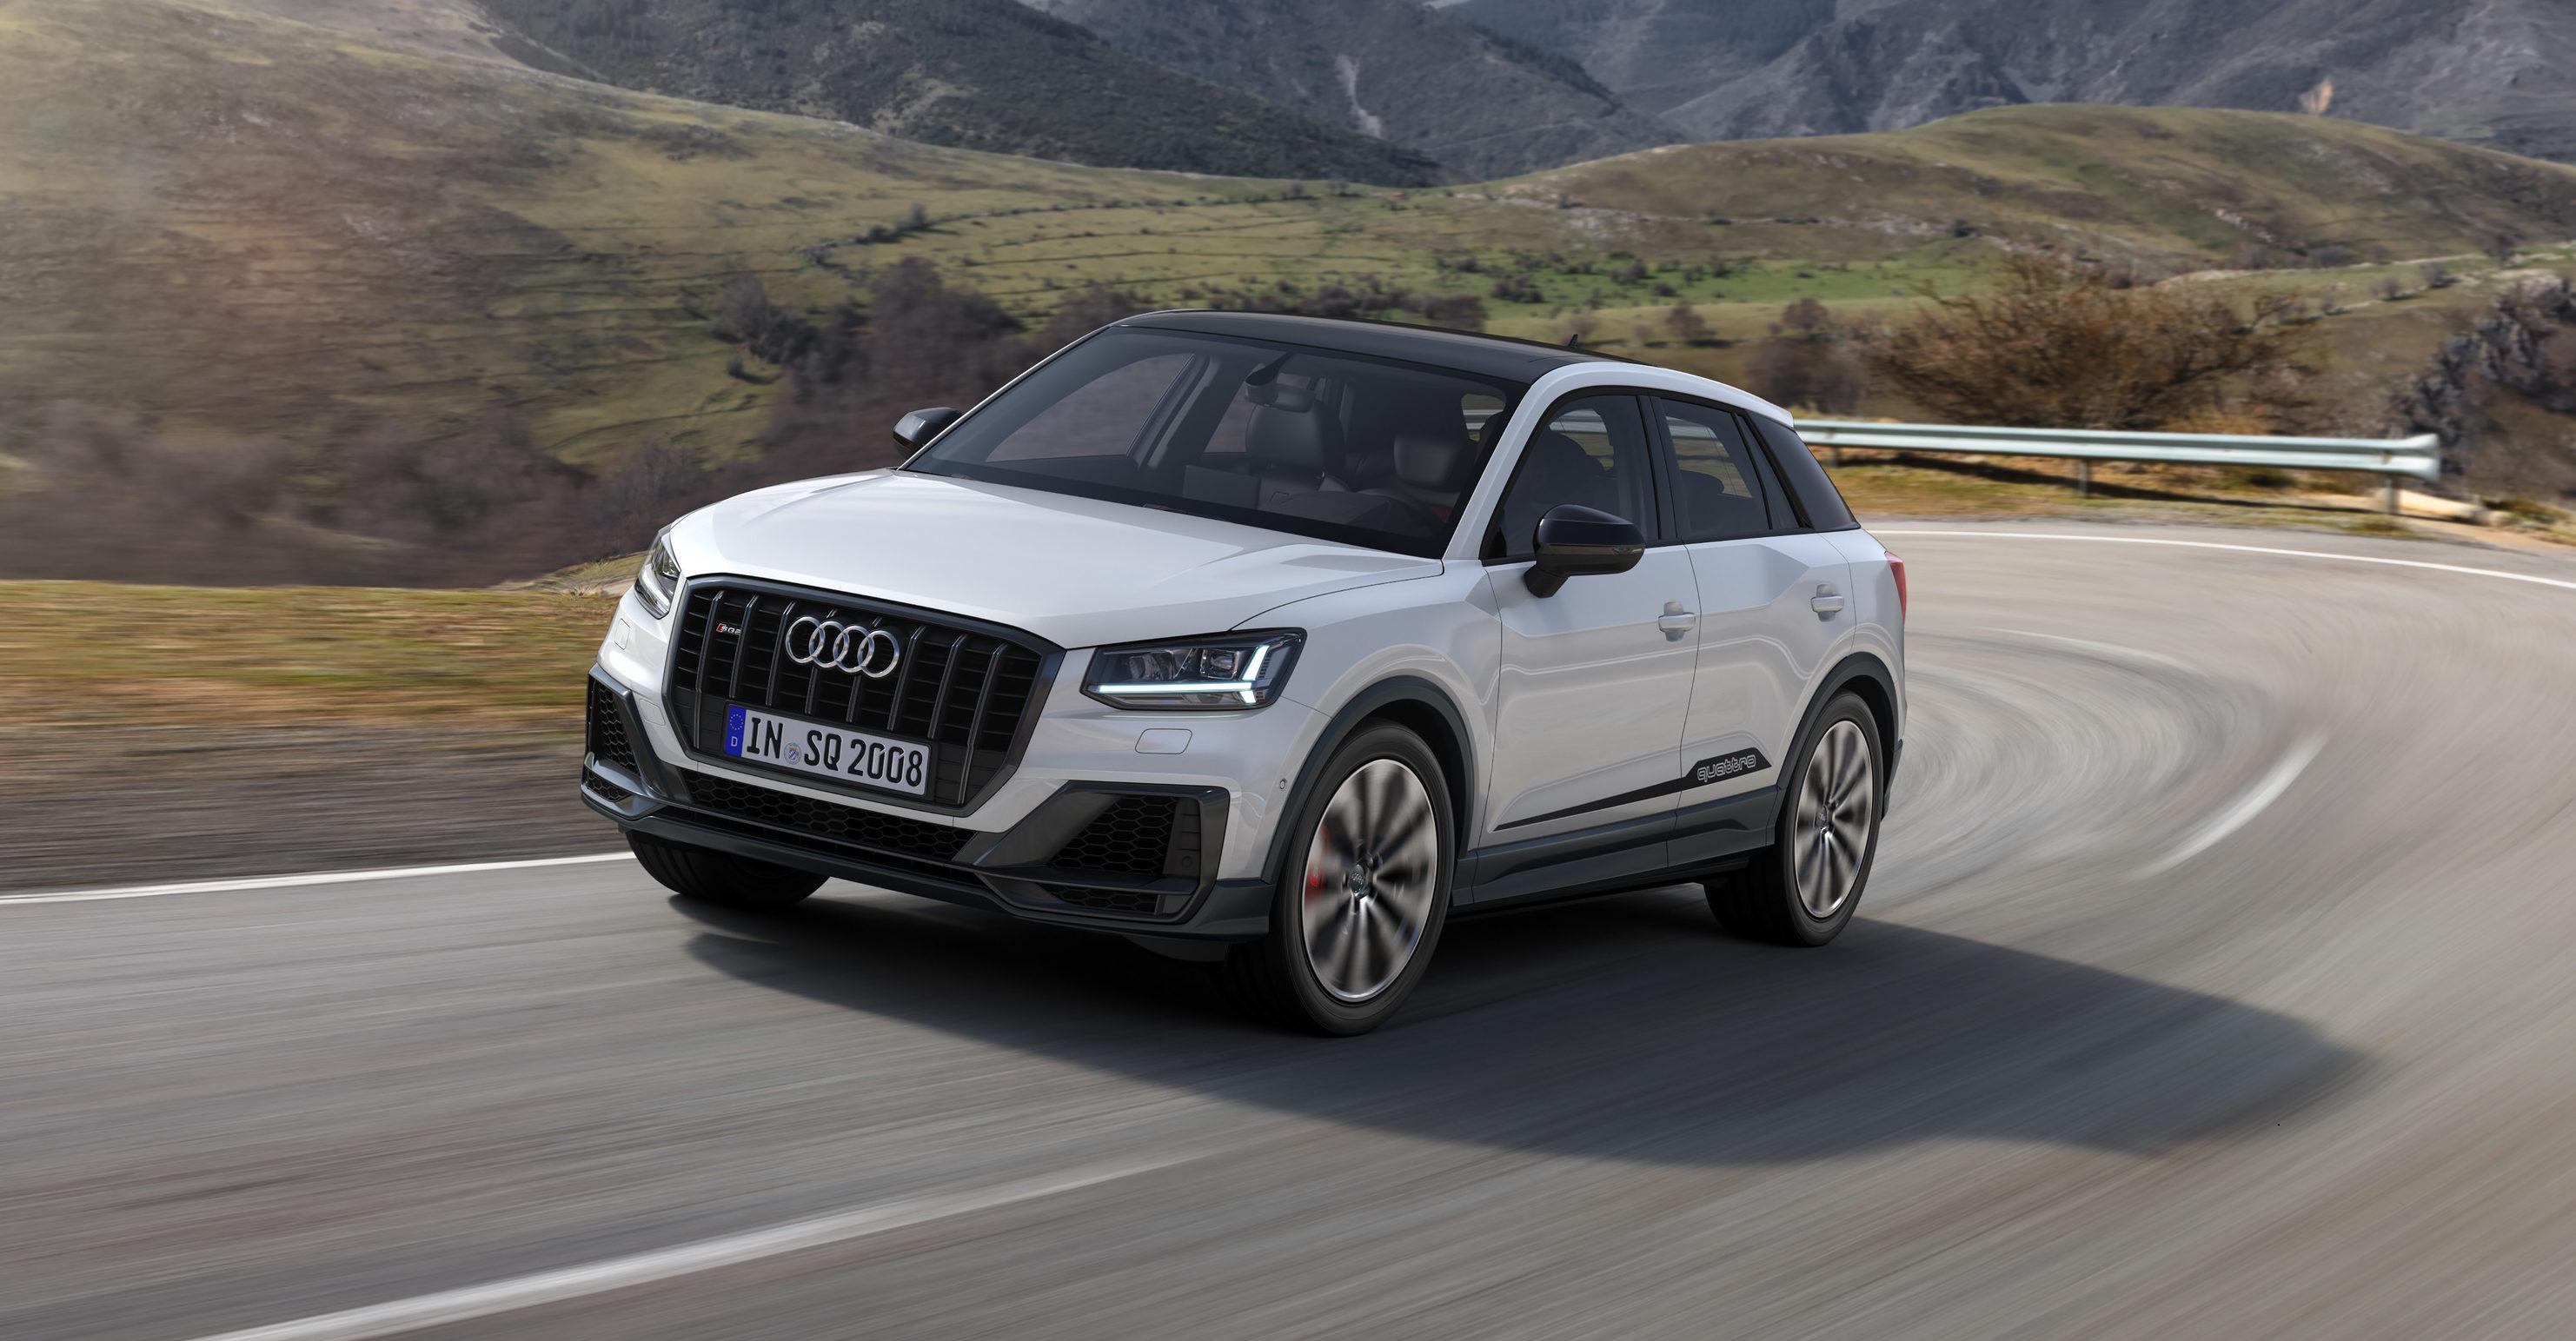 Audi SQ2 2018: Preise, Motoren & Verkaufsstart | carwow